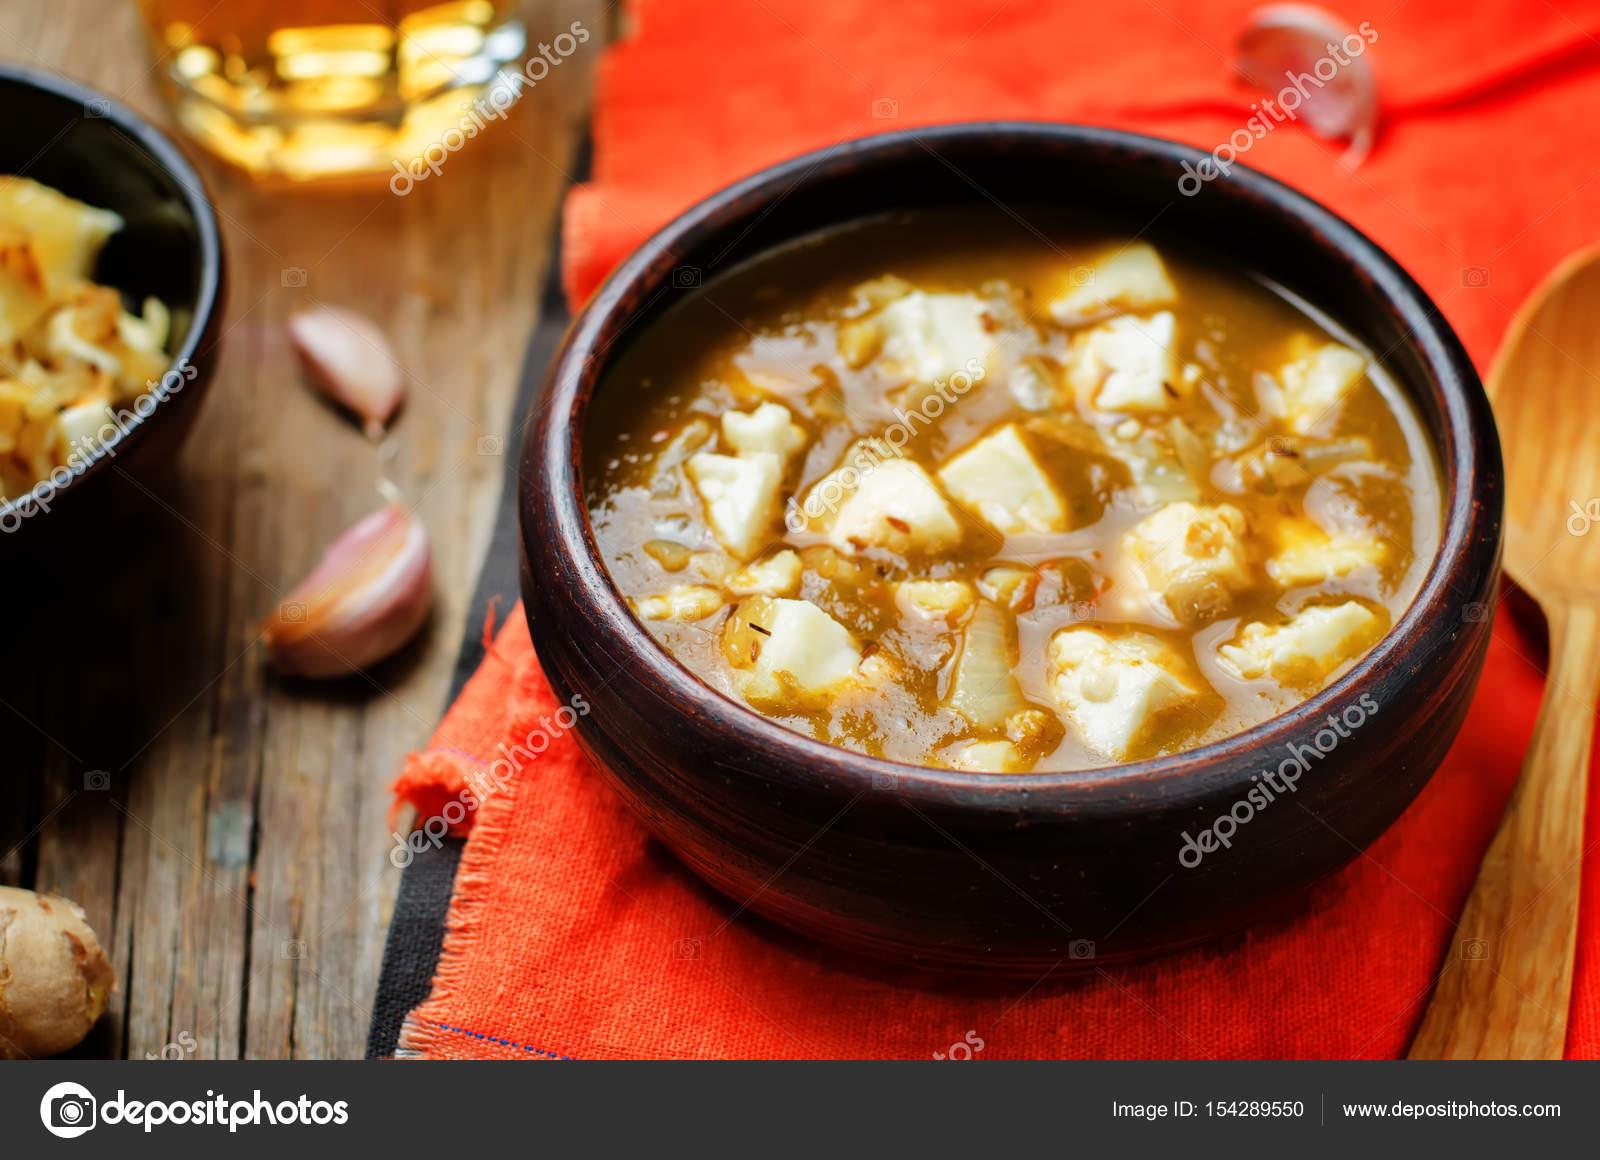 Hinduska Kuchnia Indyjska Zdjecie Stockowe C Nata Vkusidey 154289550